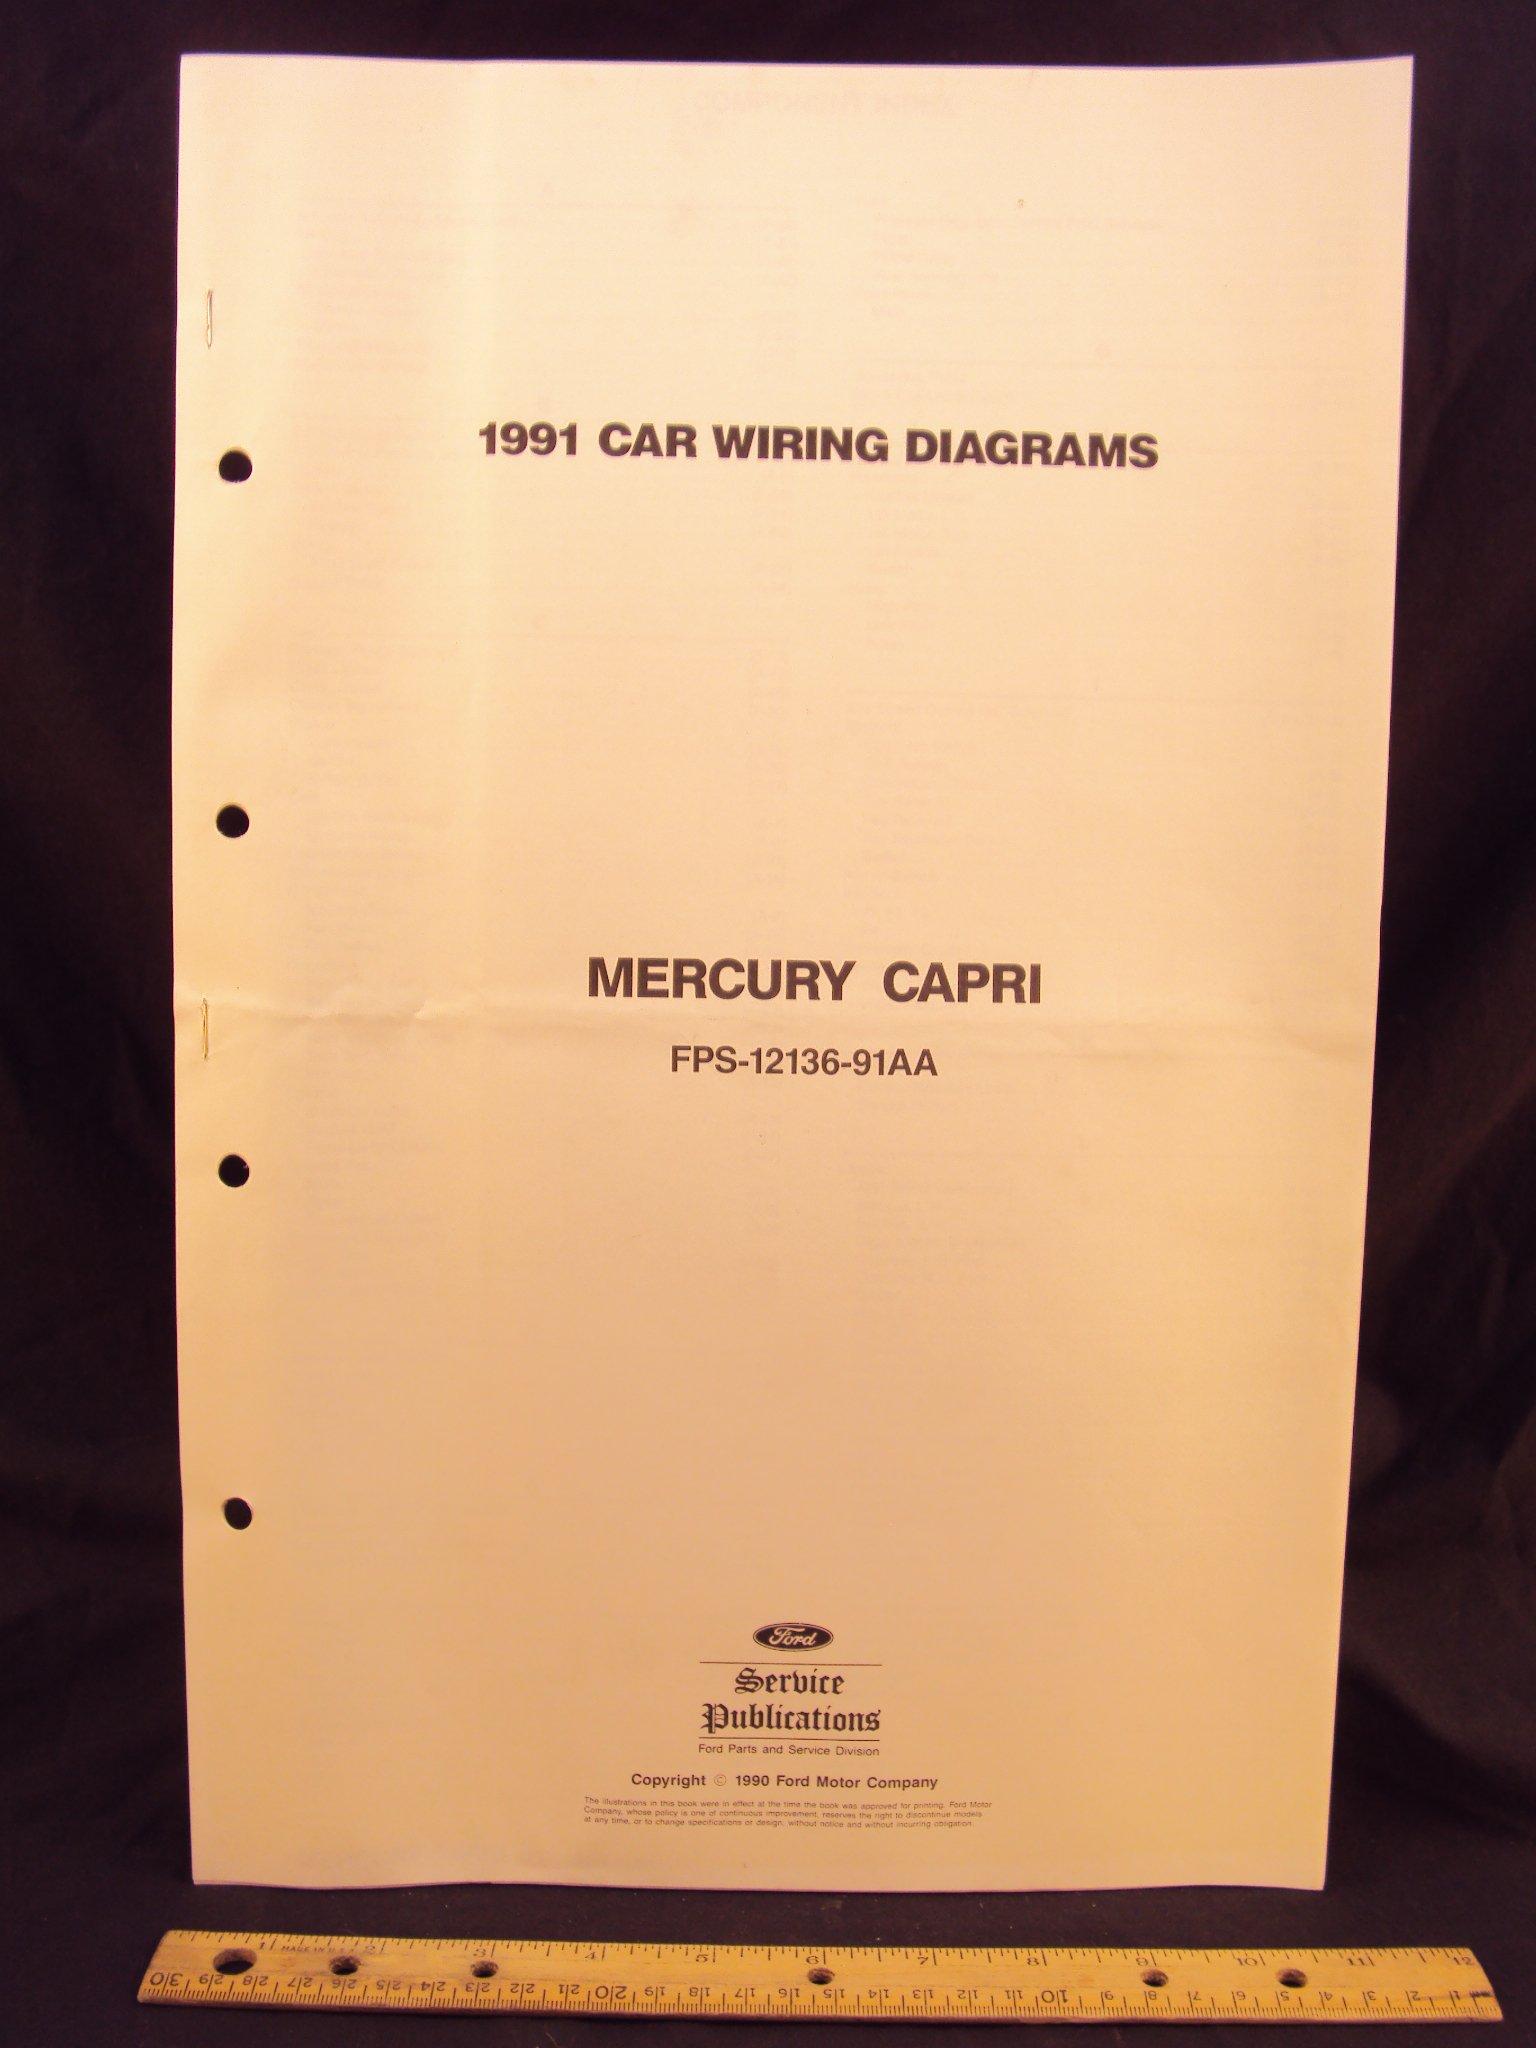 Wondrous 1991 Mercury Capri Electrical Wiring Diagrams Schematics Ford Wiring Cloud Mousmenurrecoveryedborg